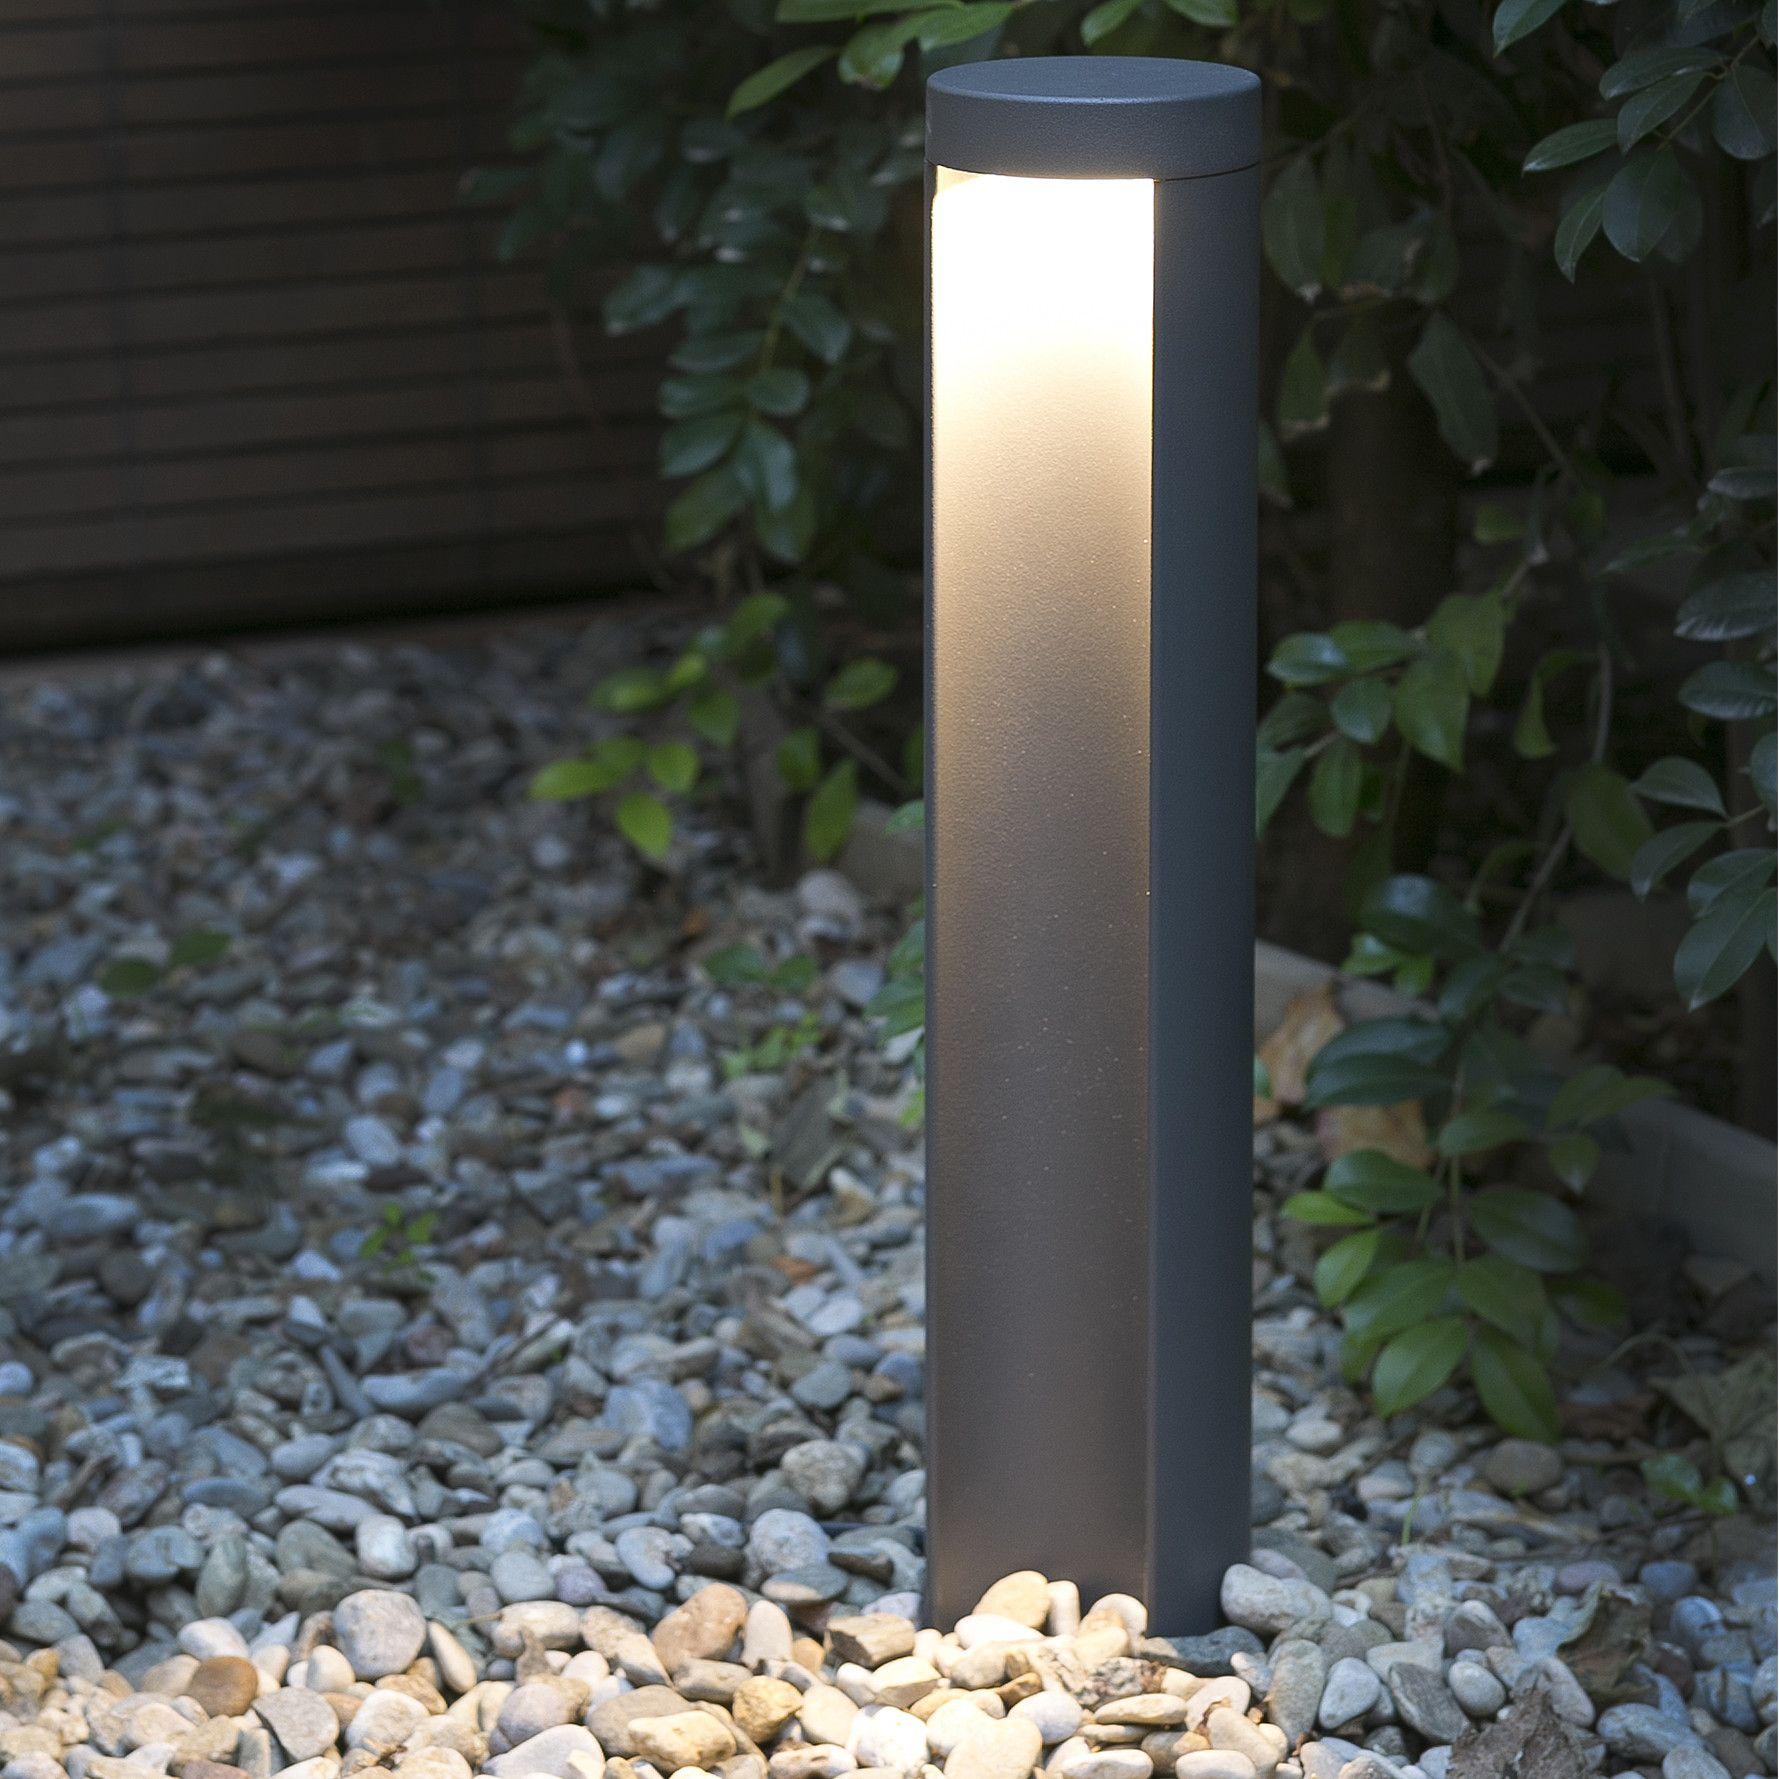 Faro Chandra Led 119 Vat Exclusive Eclairage De Jardin Lampe Jardin Luminaire Exterieur